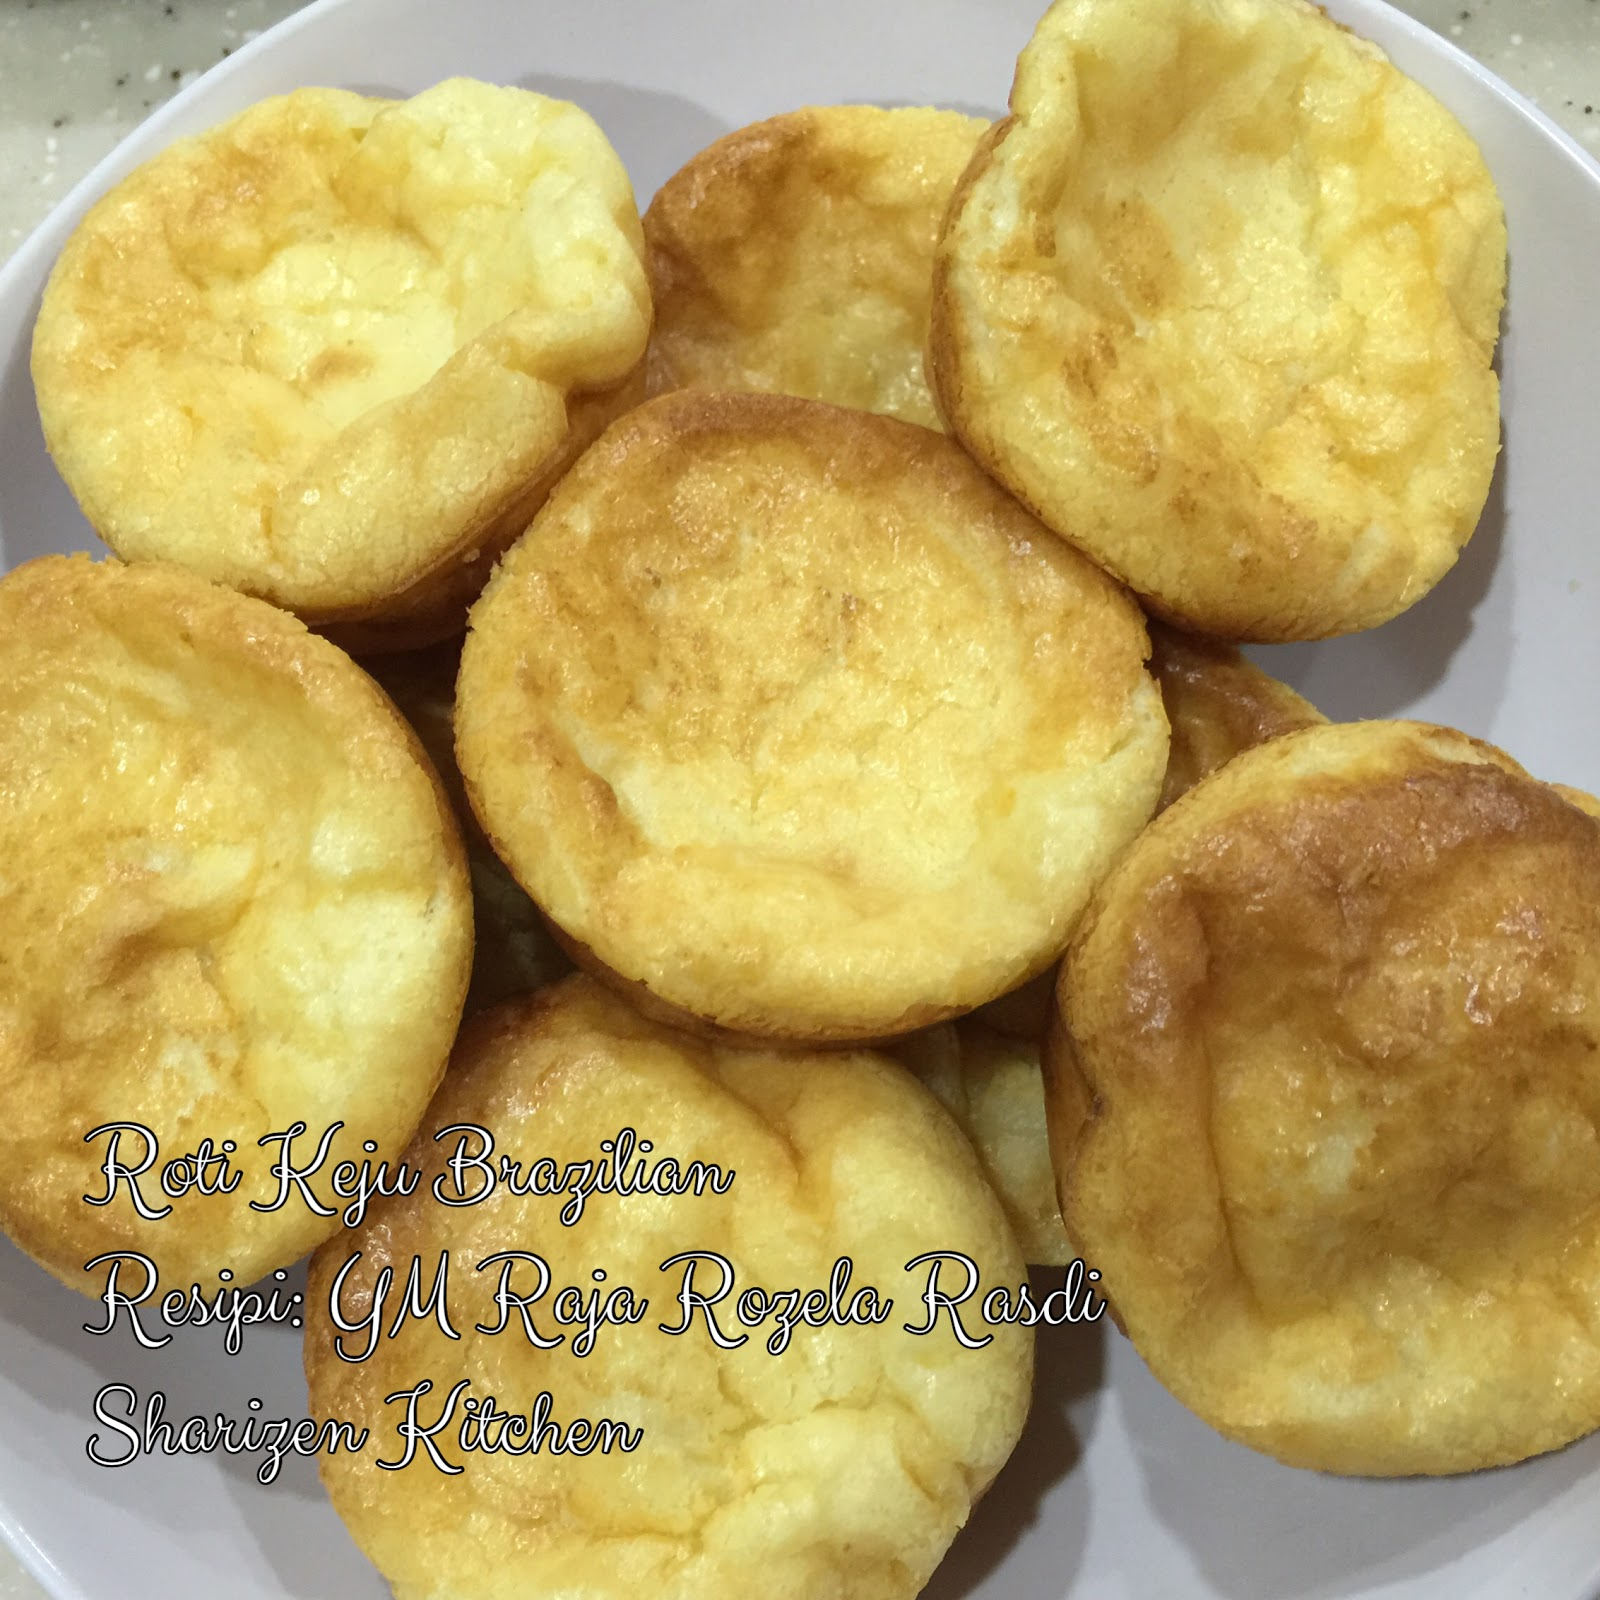 sharizen kitchen roti keju brazilian Resepi Roti Telur Susu Segar Enak dan Mudah